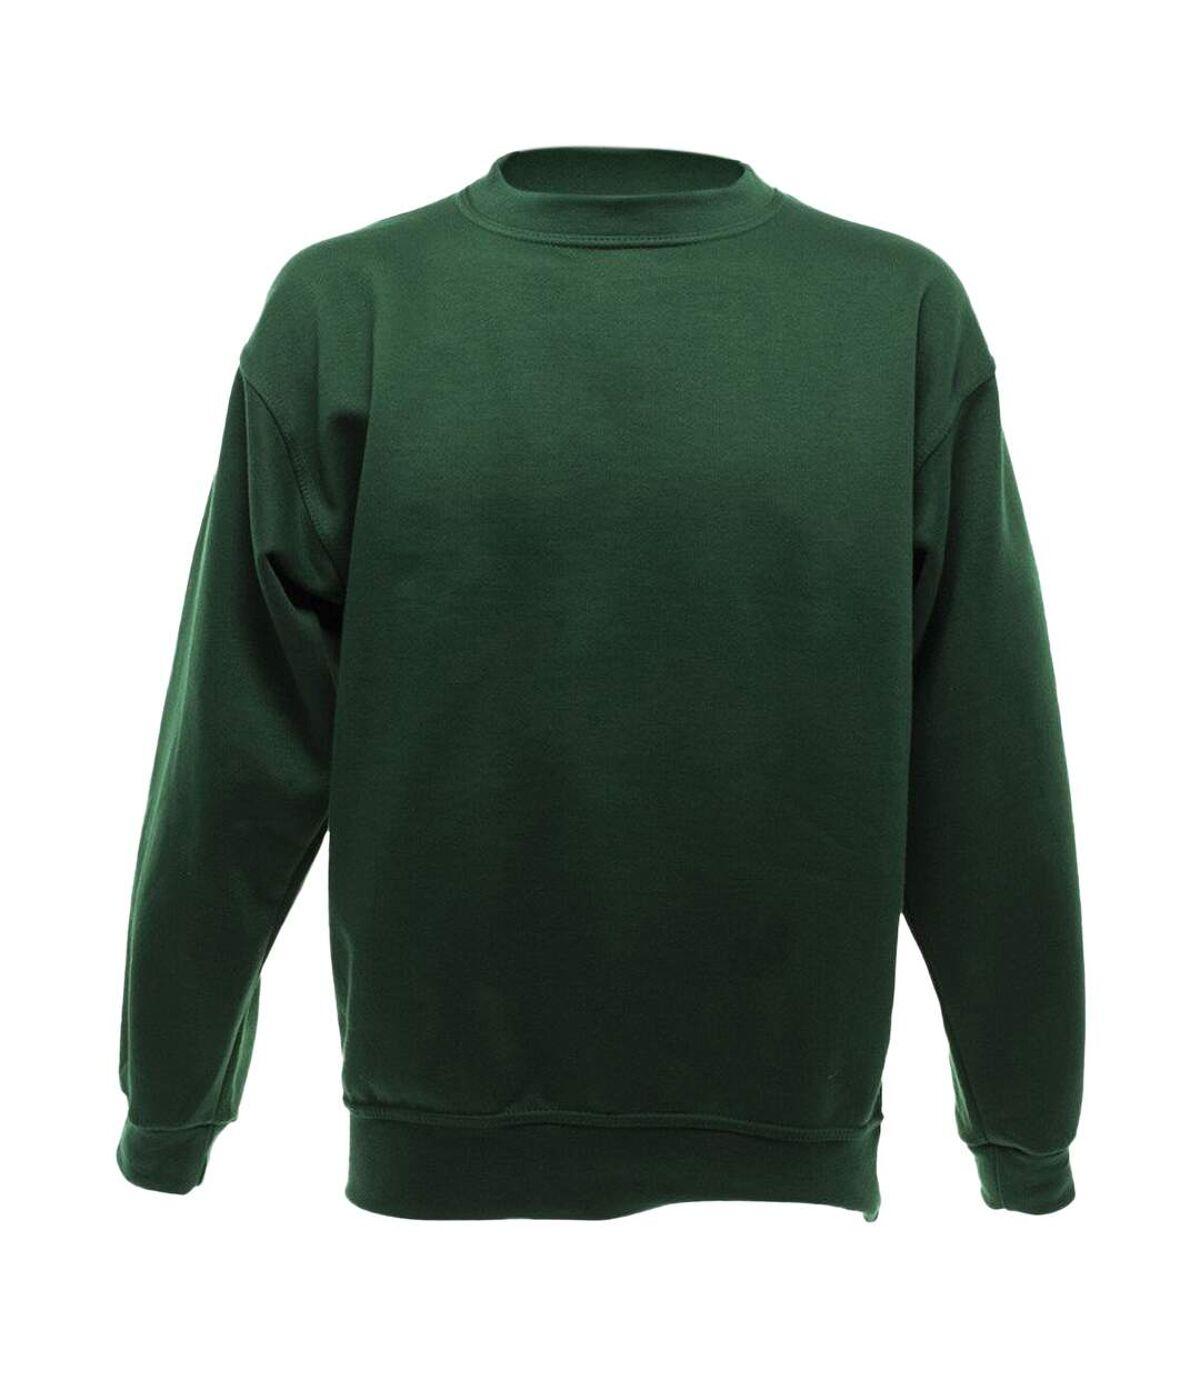 UCC 50/50 Mens Heavyweight Plain Set-In Sweatshirt Top (Bottle Green) - UTBC1193